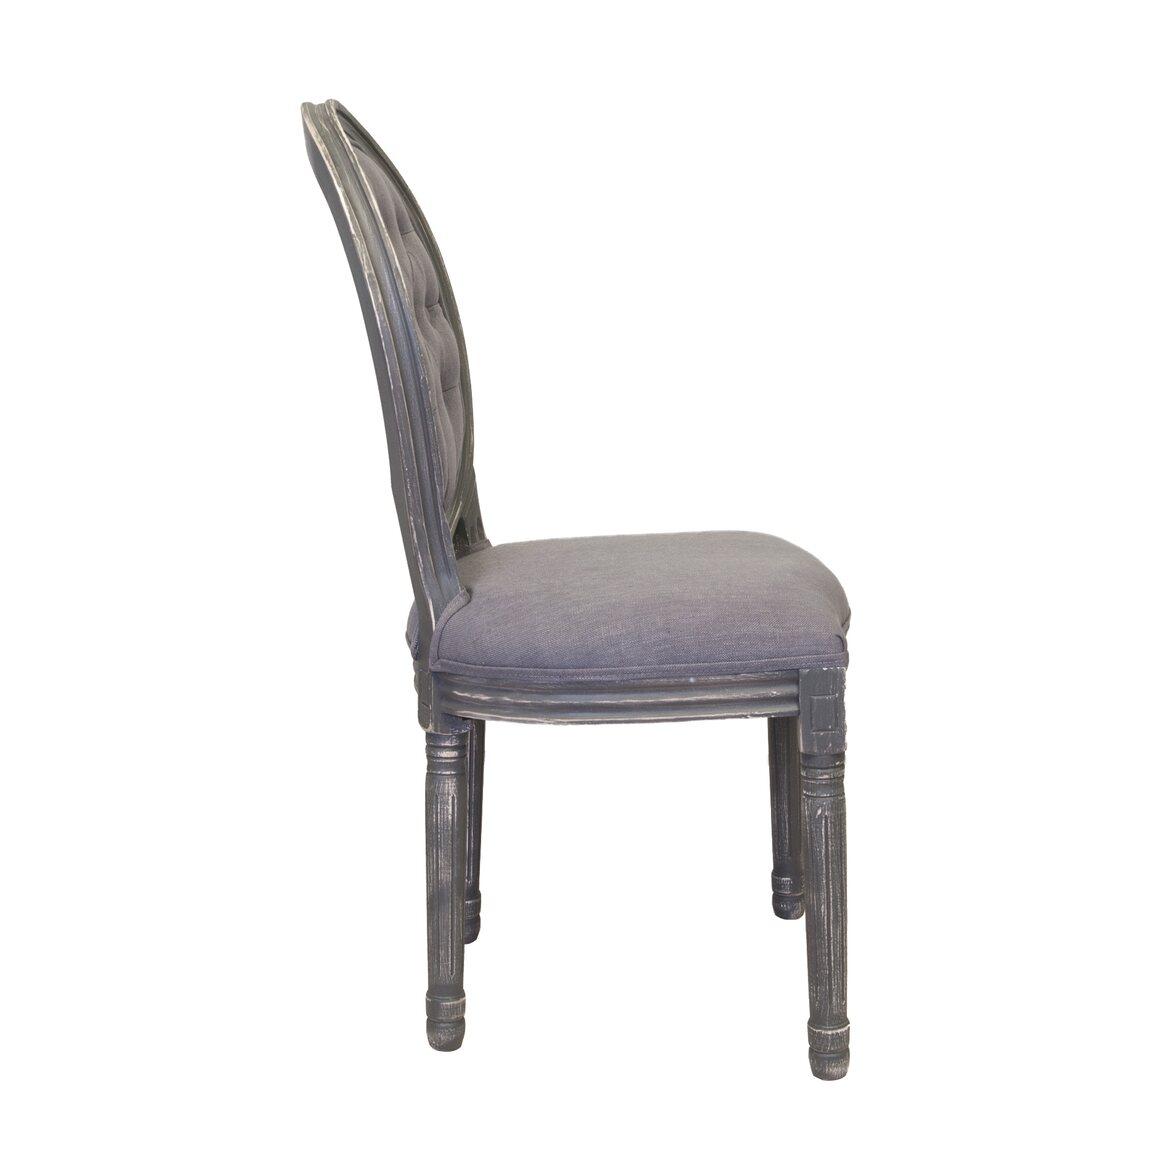 Стул Volker button grey 2 | Обеденные стулья Kingsby